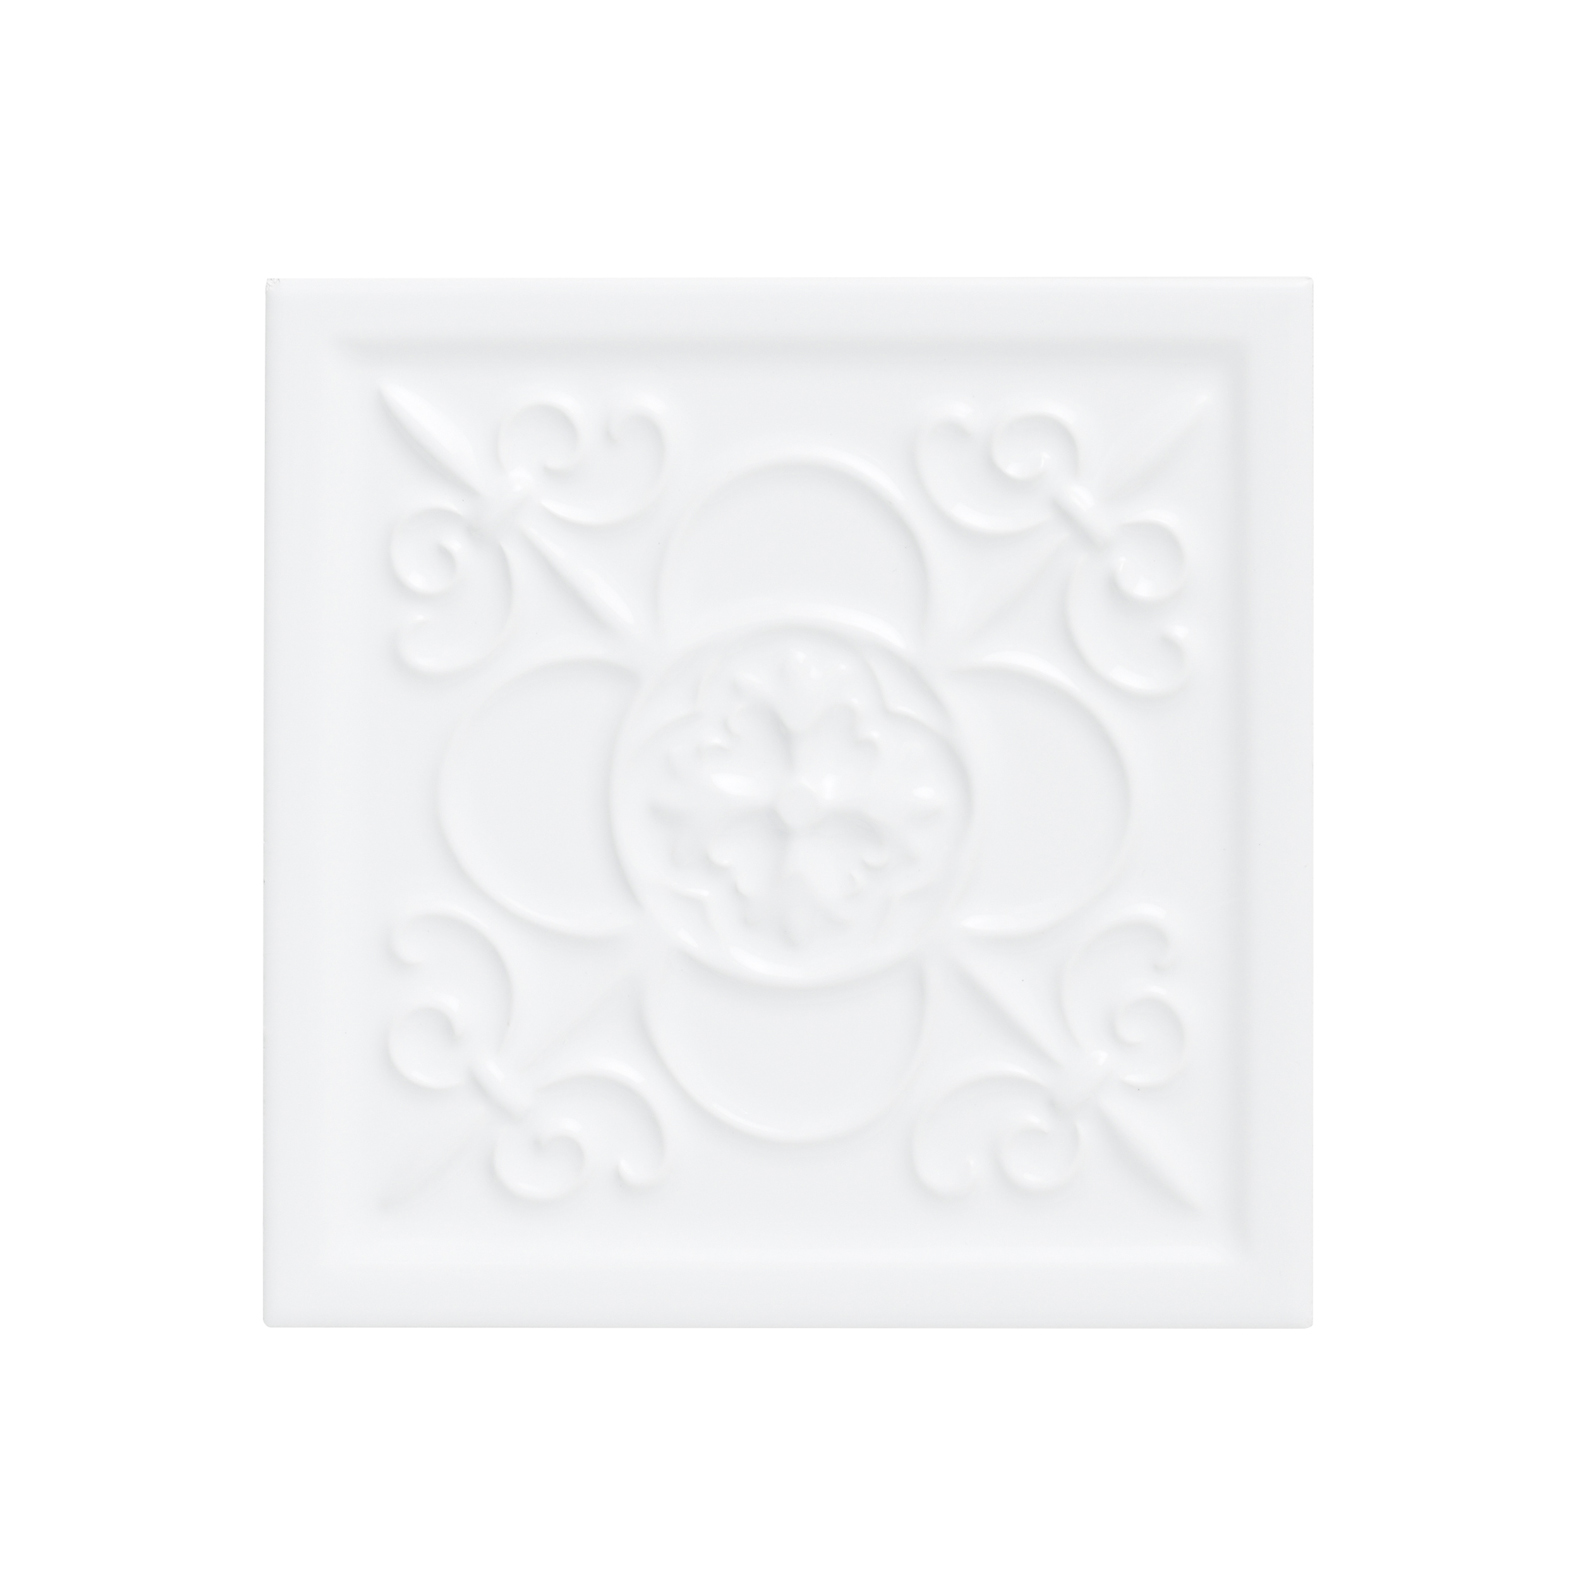 ADST4028 - RELIEVE VIZCAYA - 14.8 cm X 14.8 cm